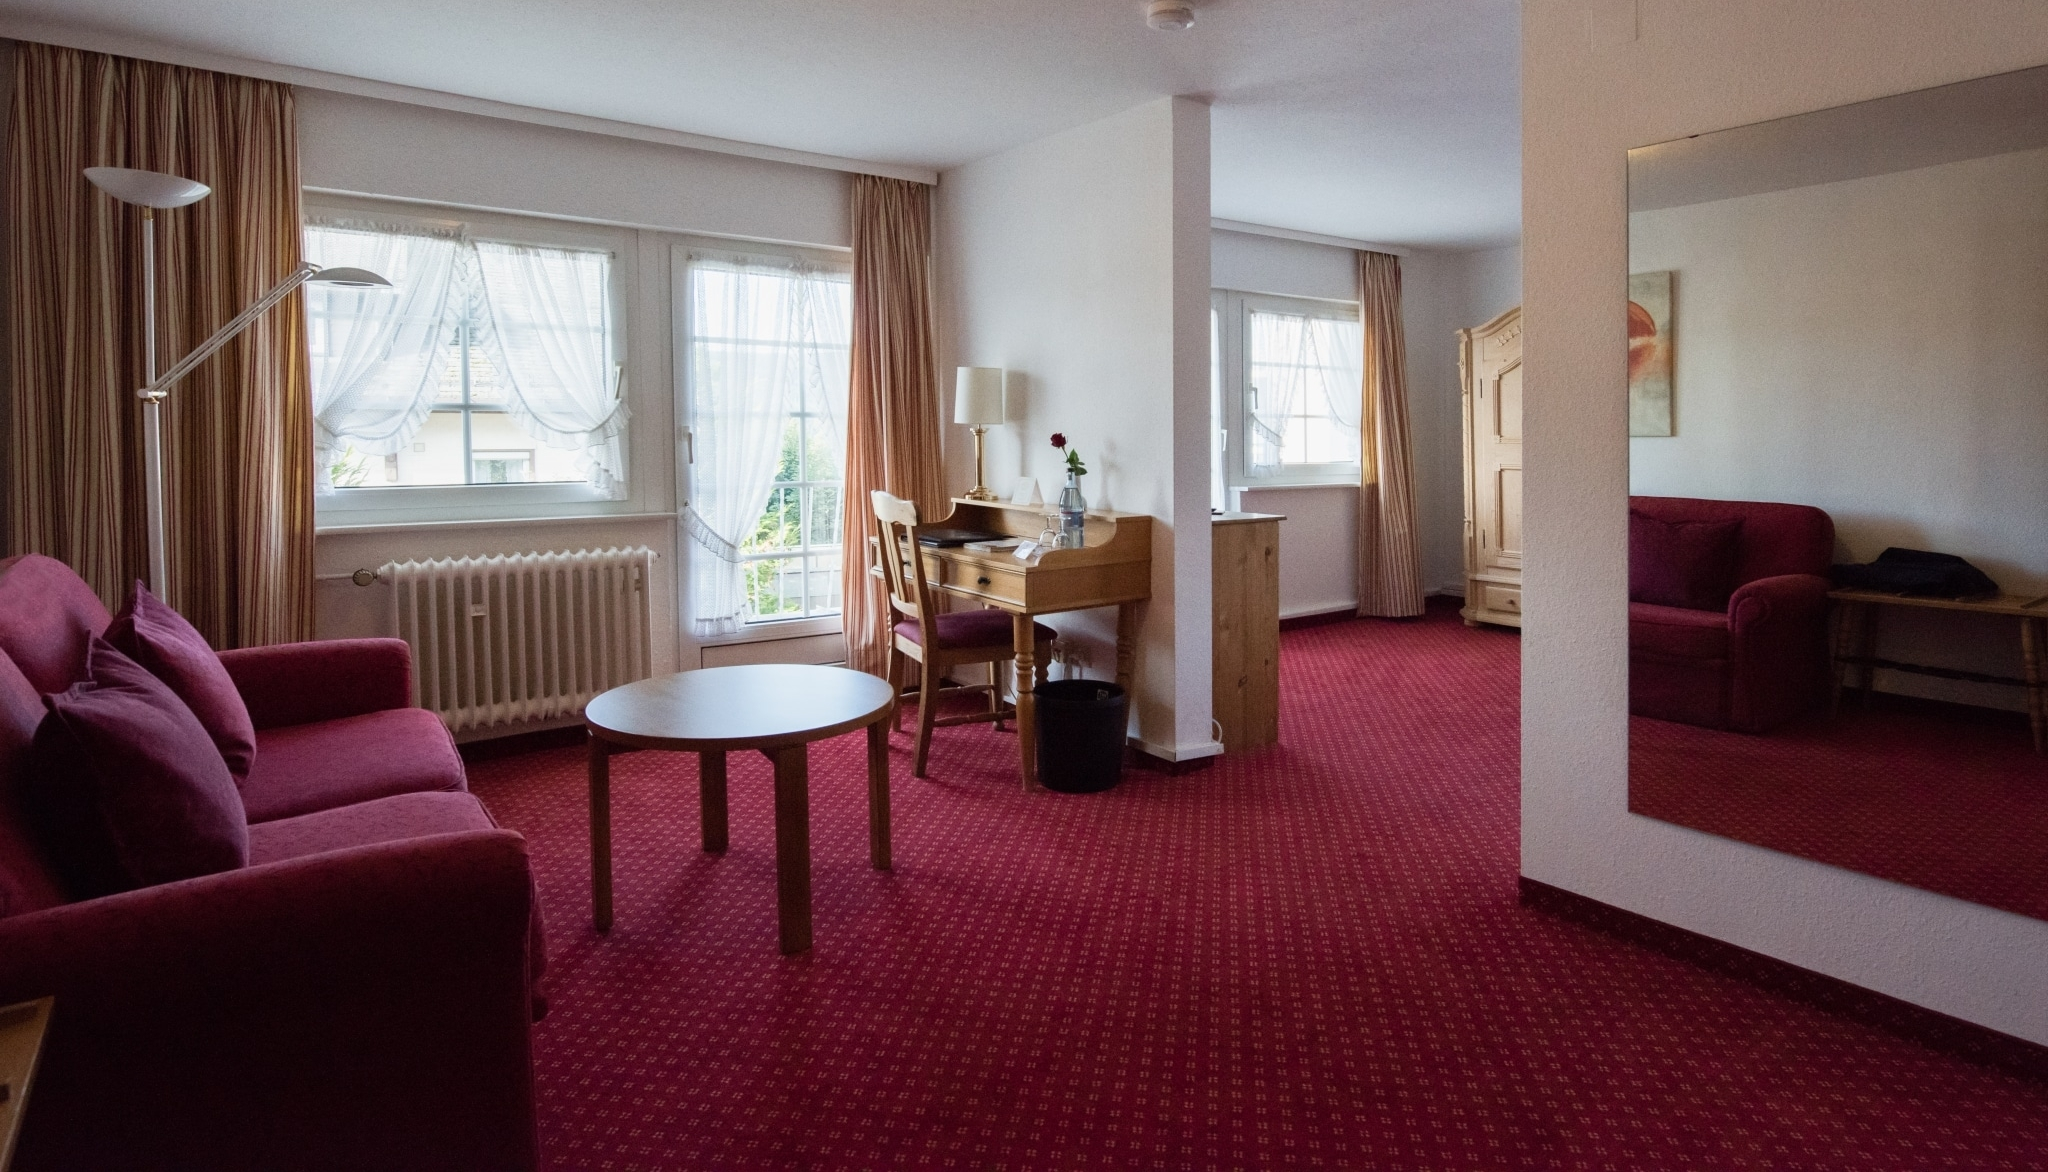 Doppelzimmer Superior im Hotel Schiff